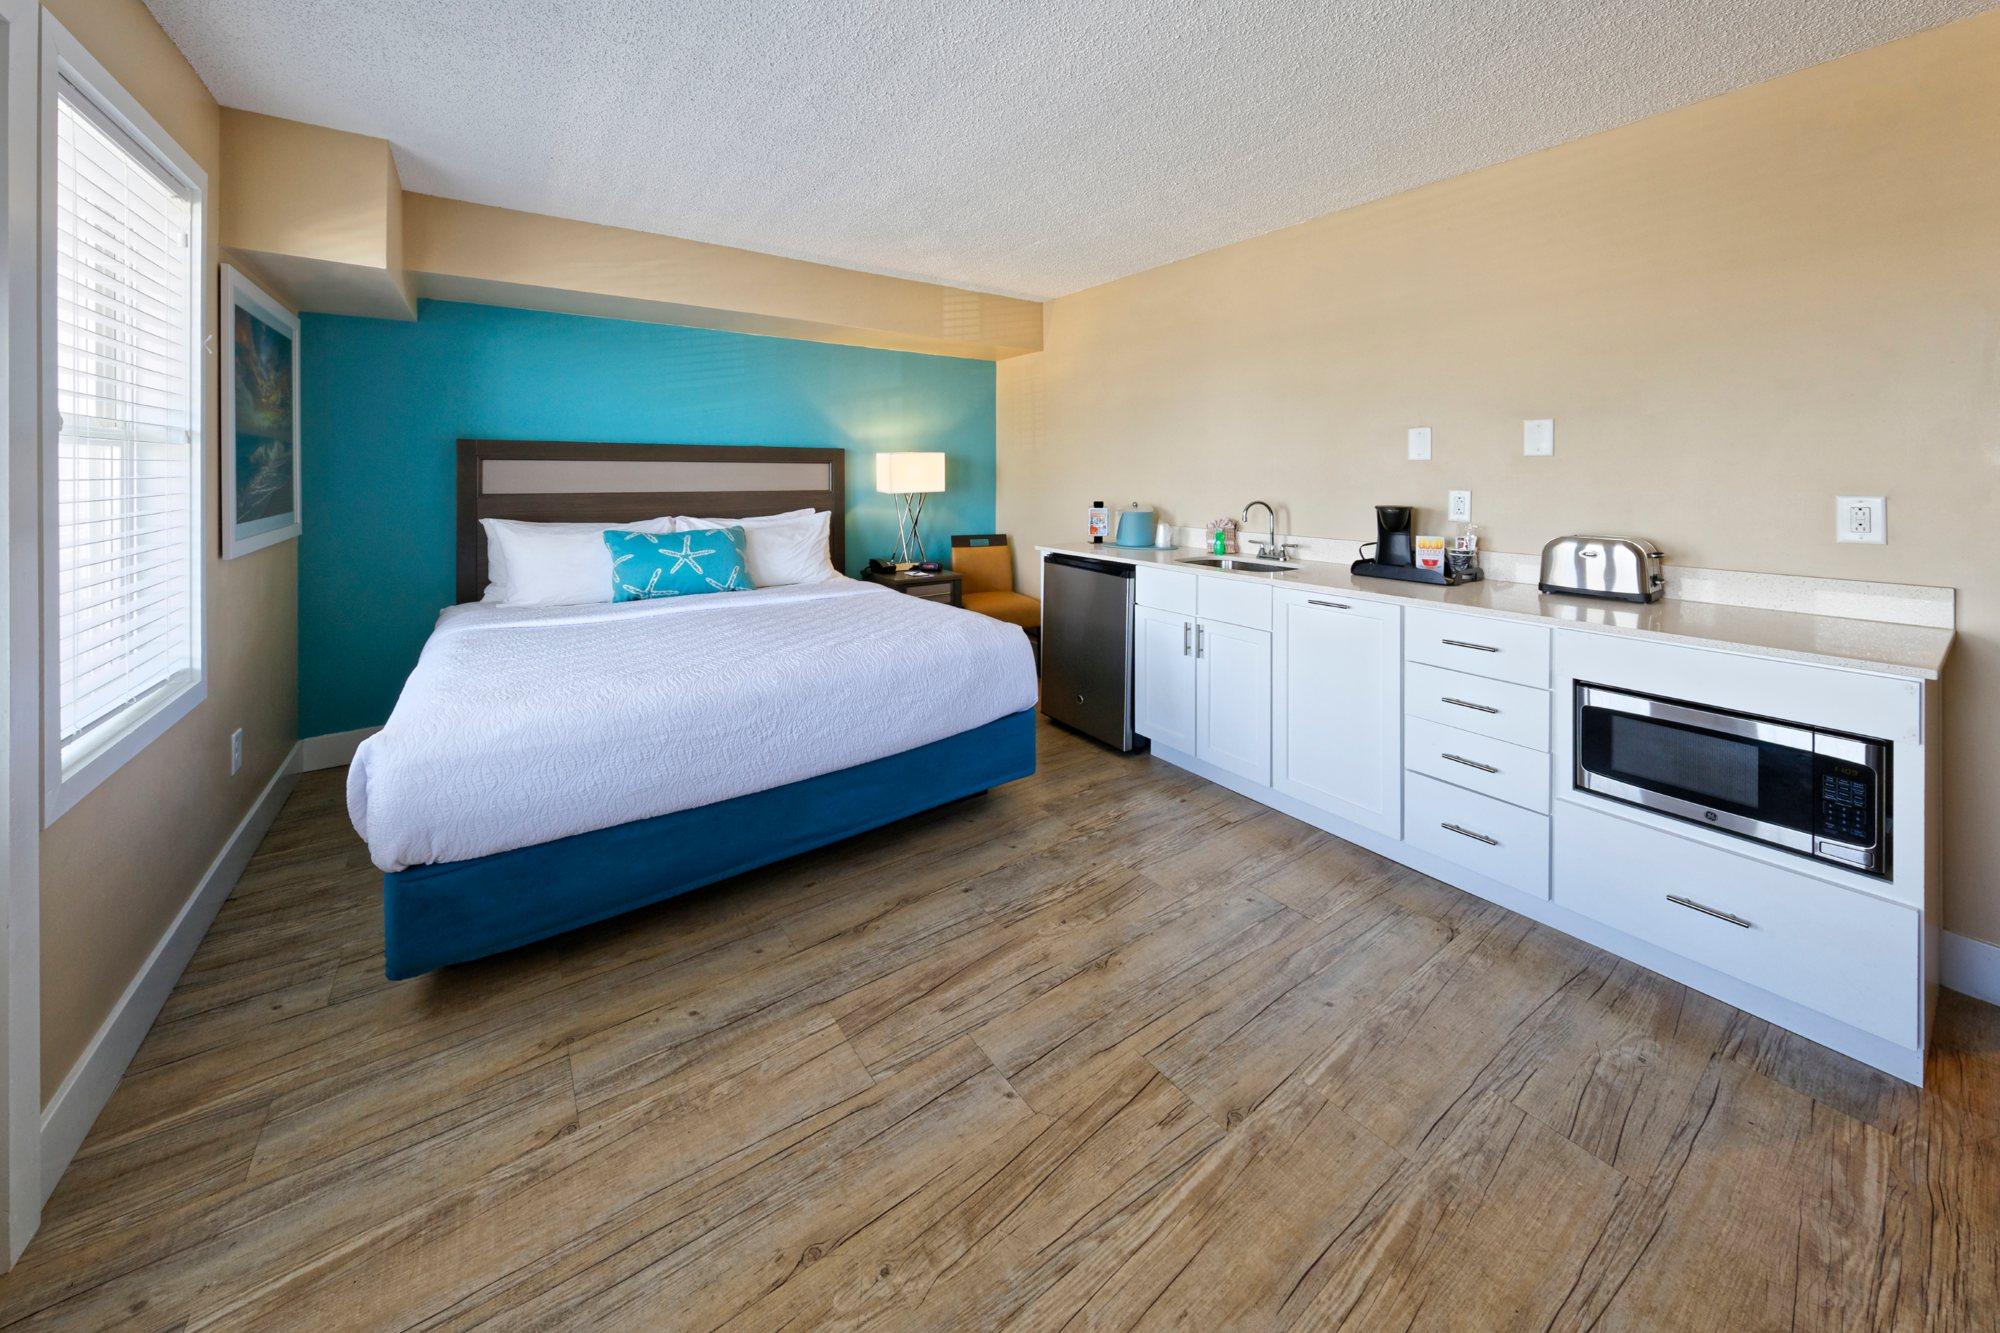 Commander Hotel Guest Room